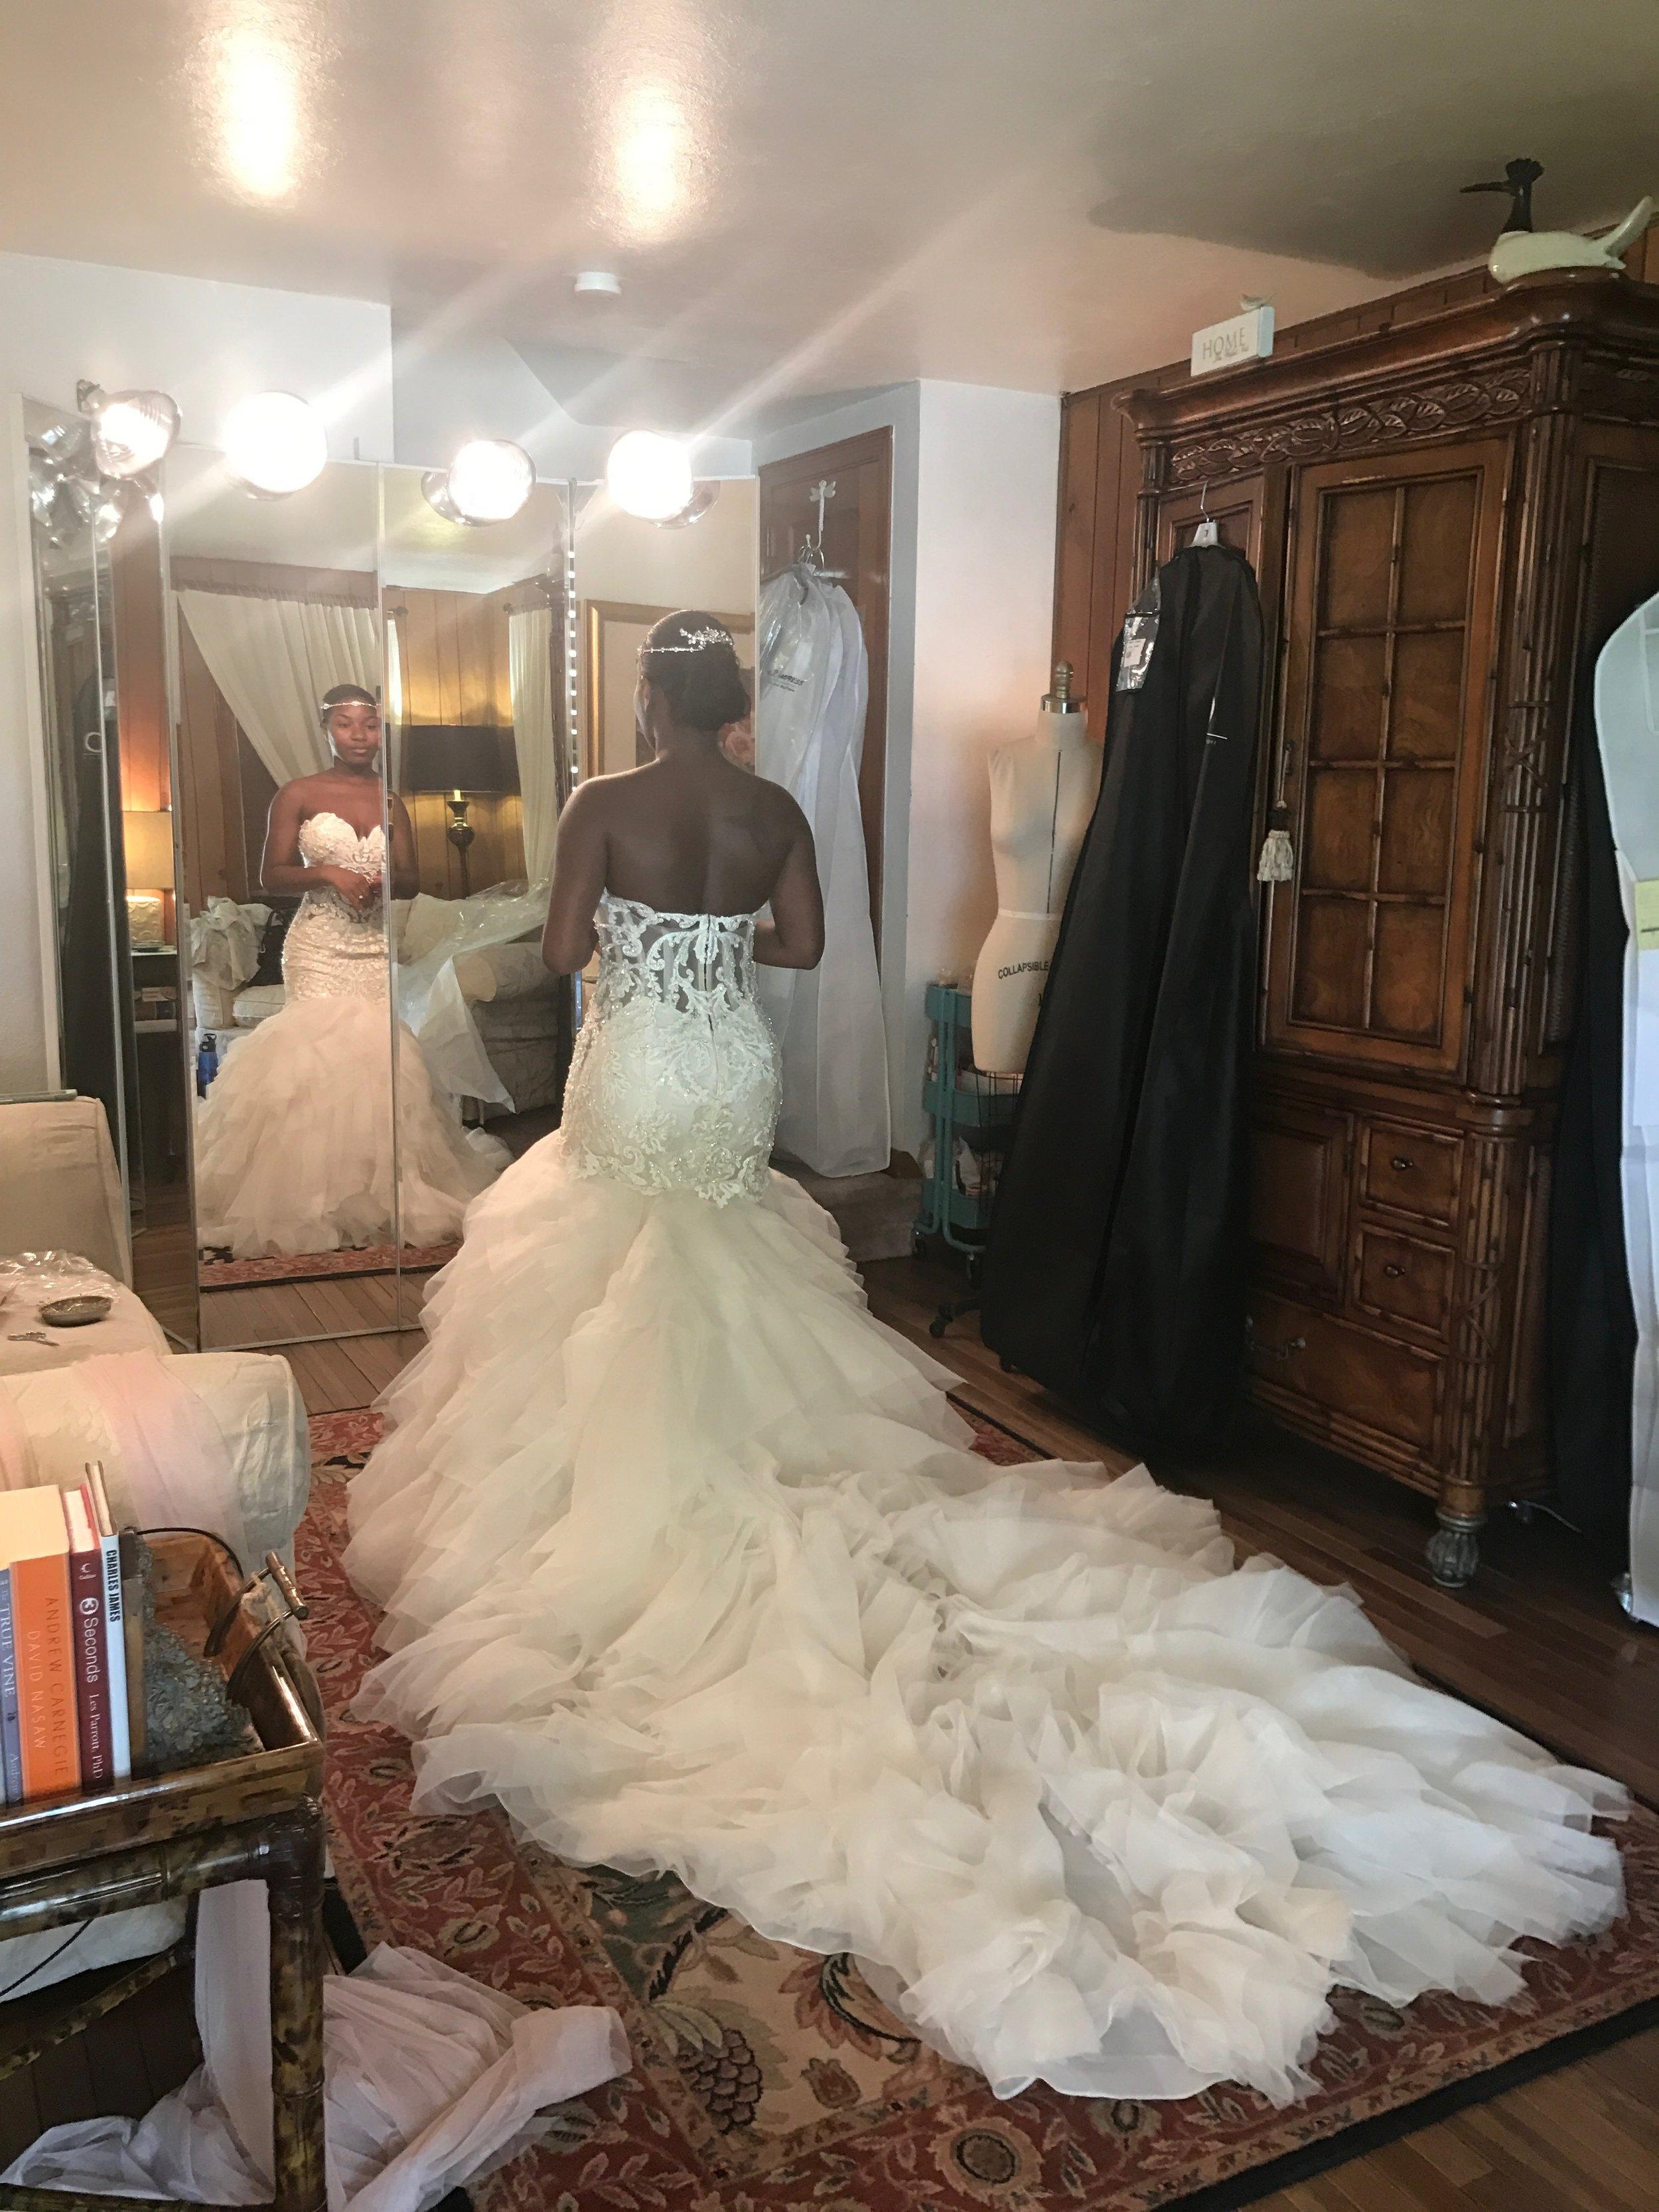 Black Destination Bride - BlackDesti Wedding Journal - Bridefriends Podcast -10 - dress fitting3 - 2 veils.JPG